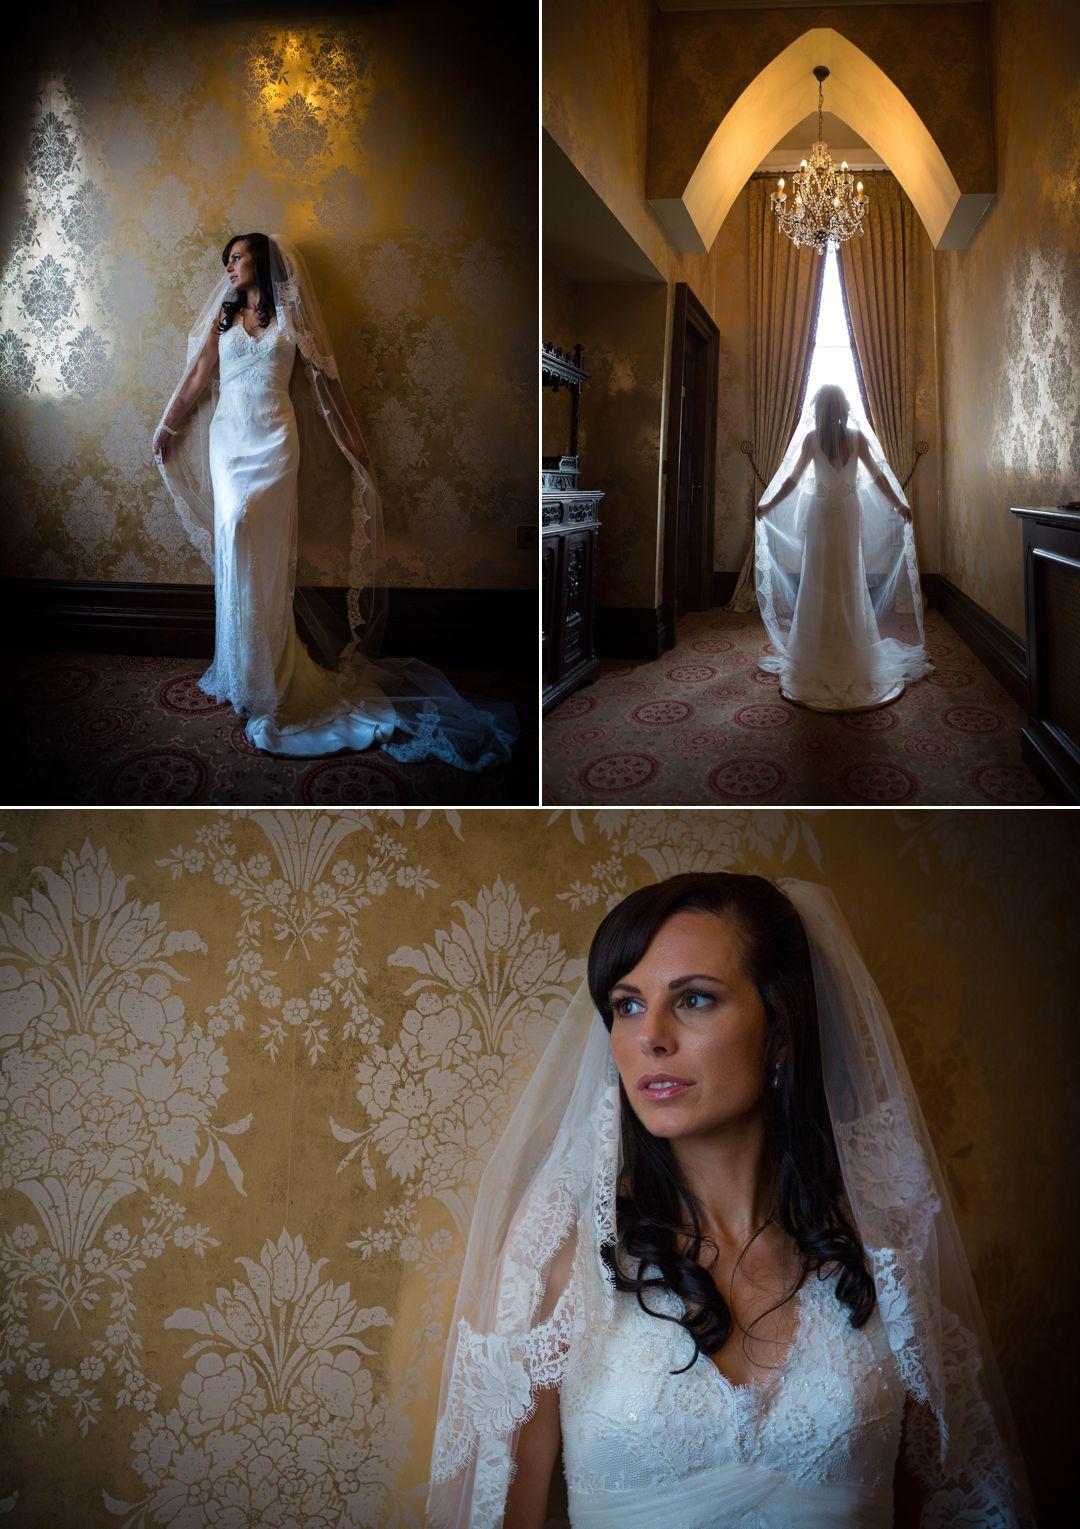 20 September 2013 / Kilronan Castle MARY & ADRIAN number 24